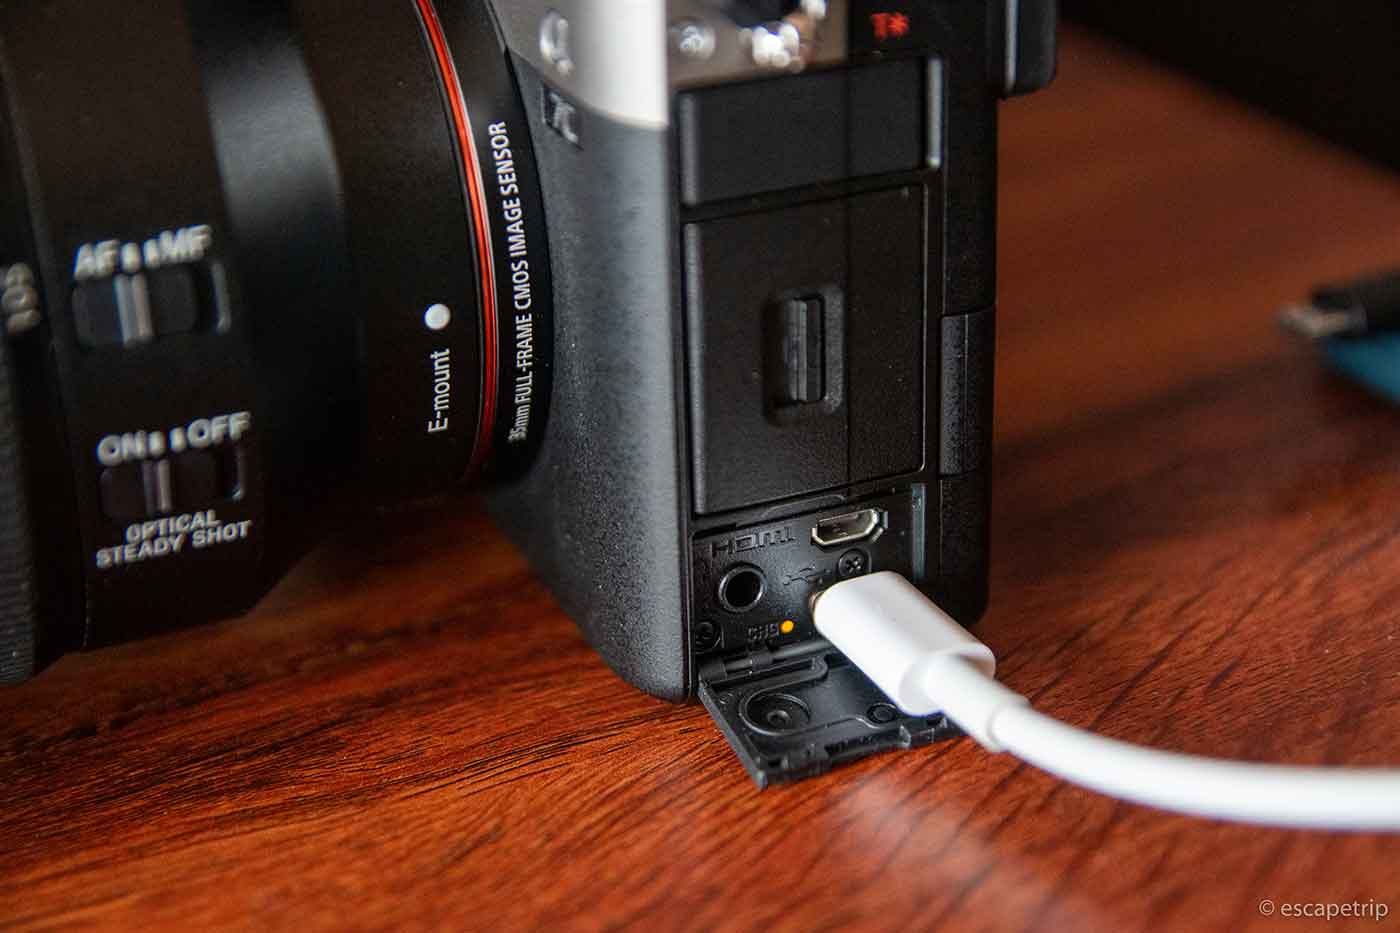 USB-Cケーブルで充電するミラーレス一眼